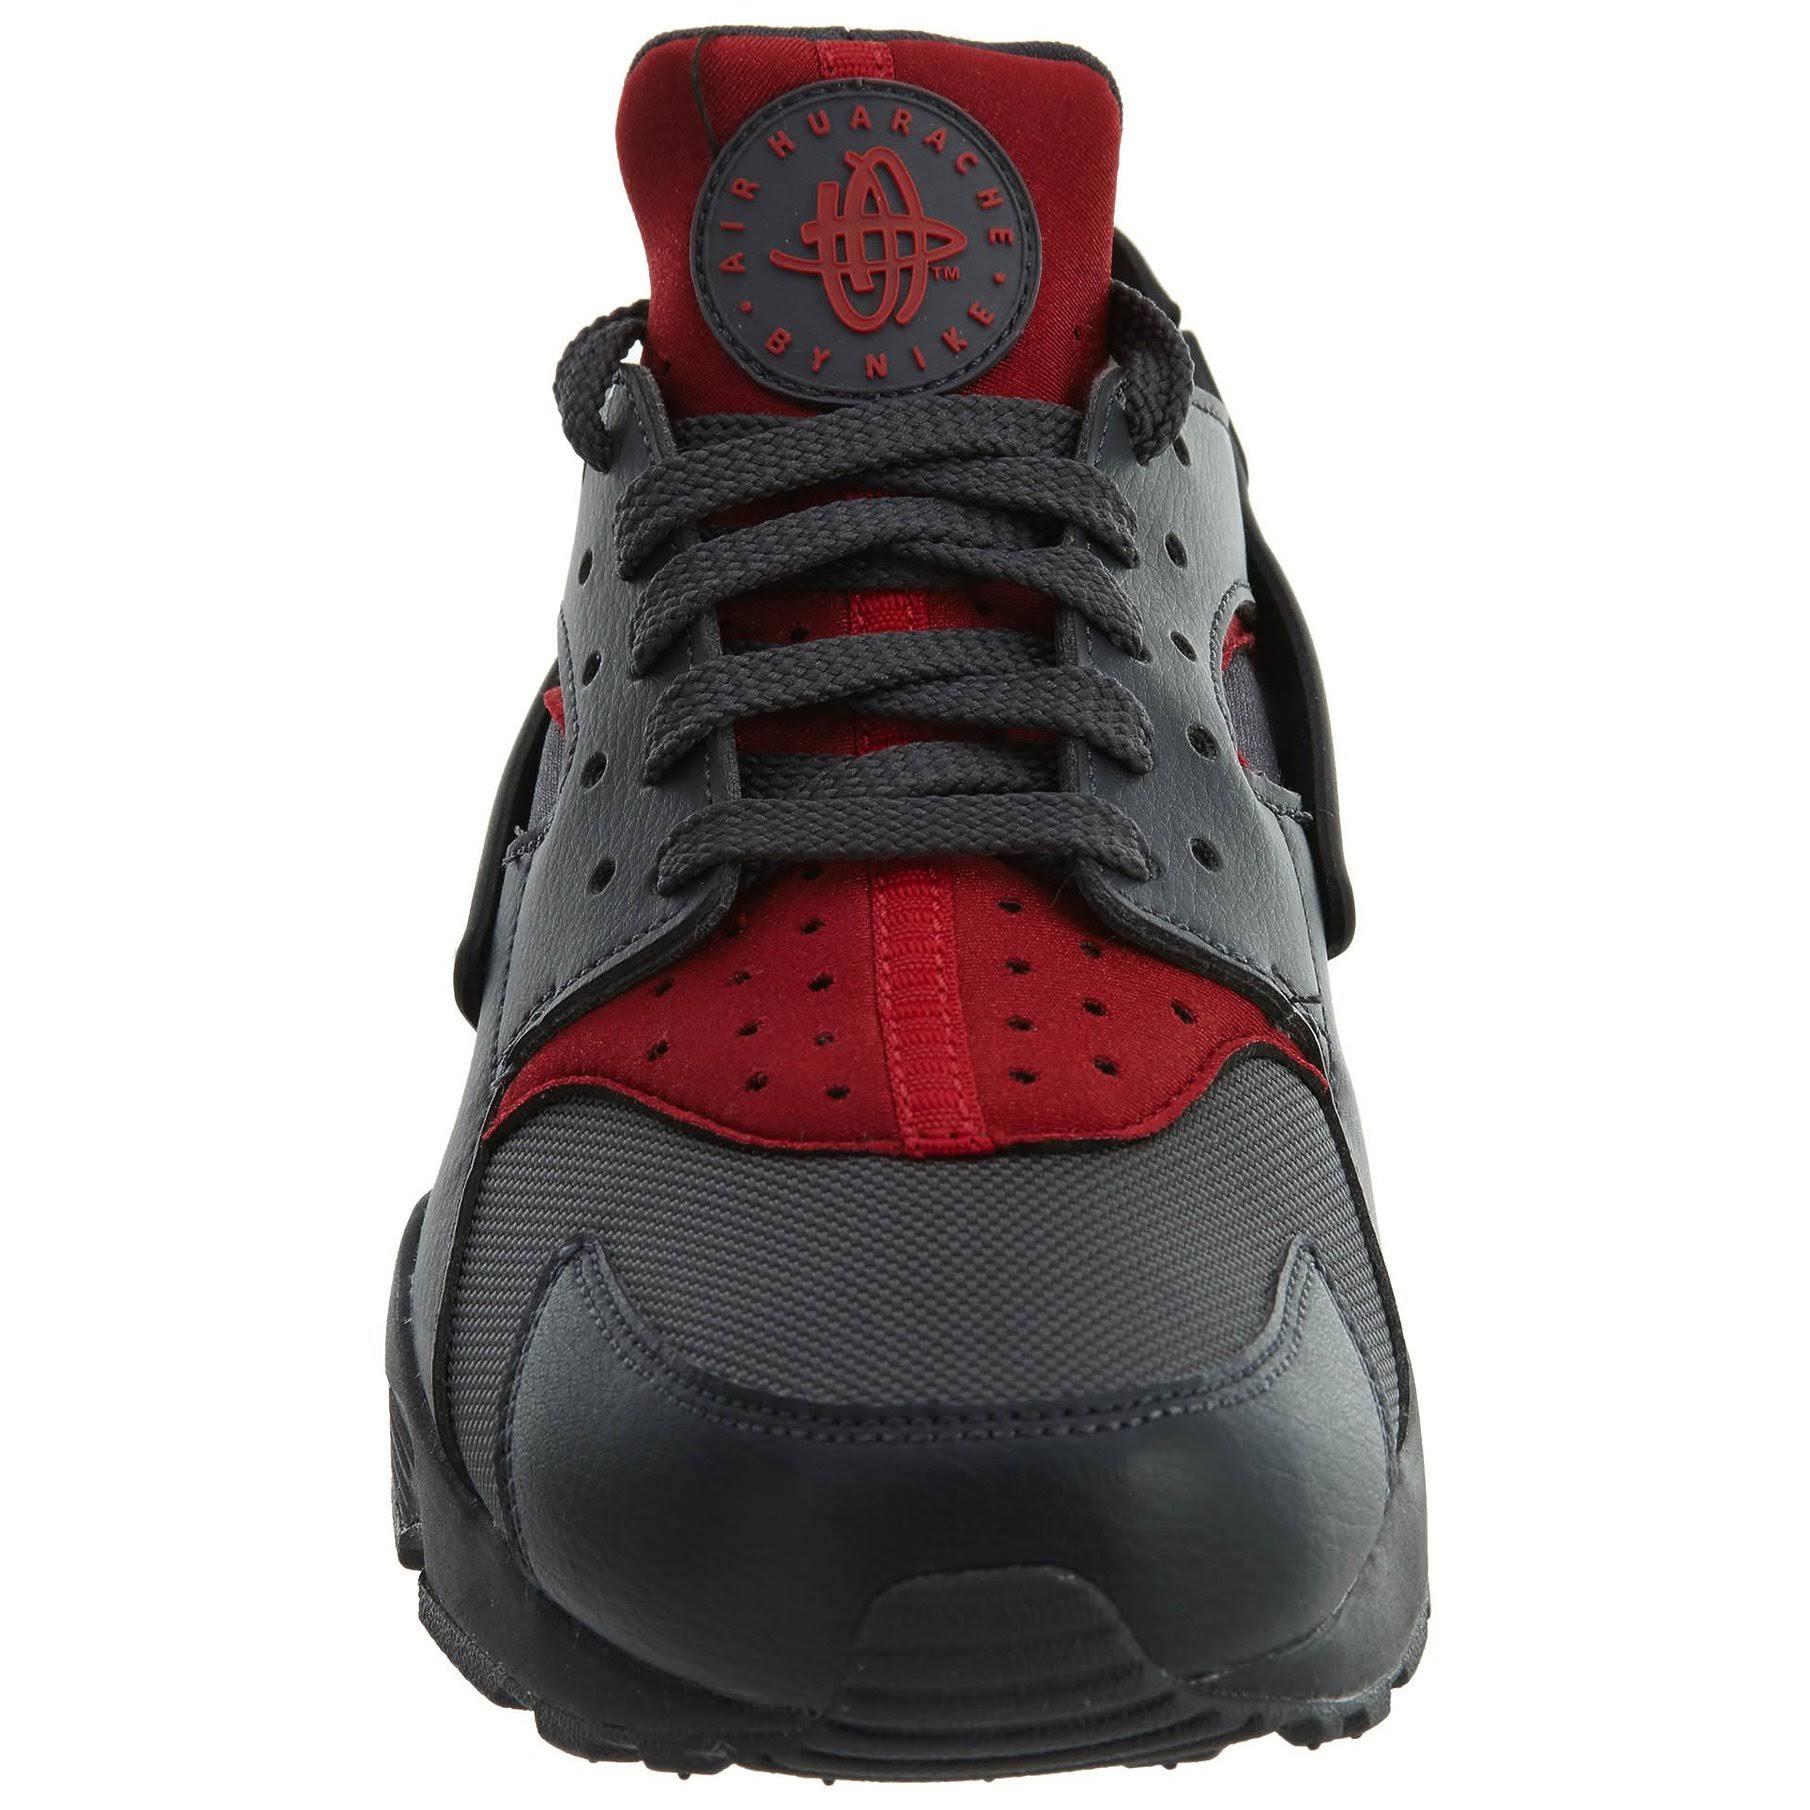 Air Huarache Huarache Nike Nike Nike Air Air Huarache Air Nike fym6gvYIb7